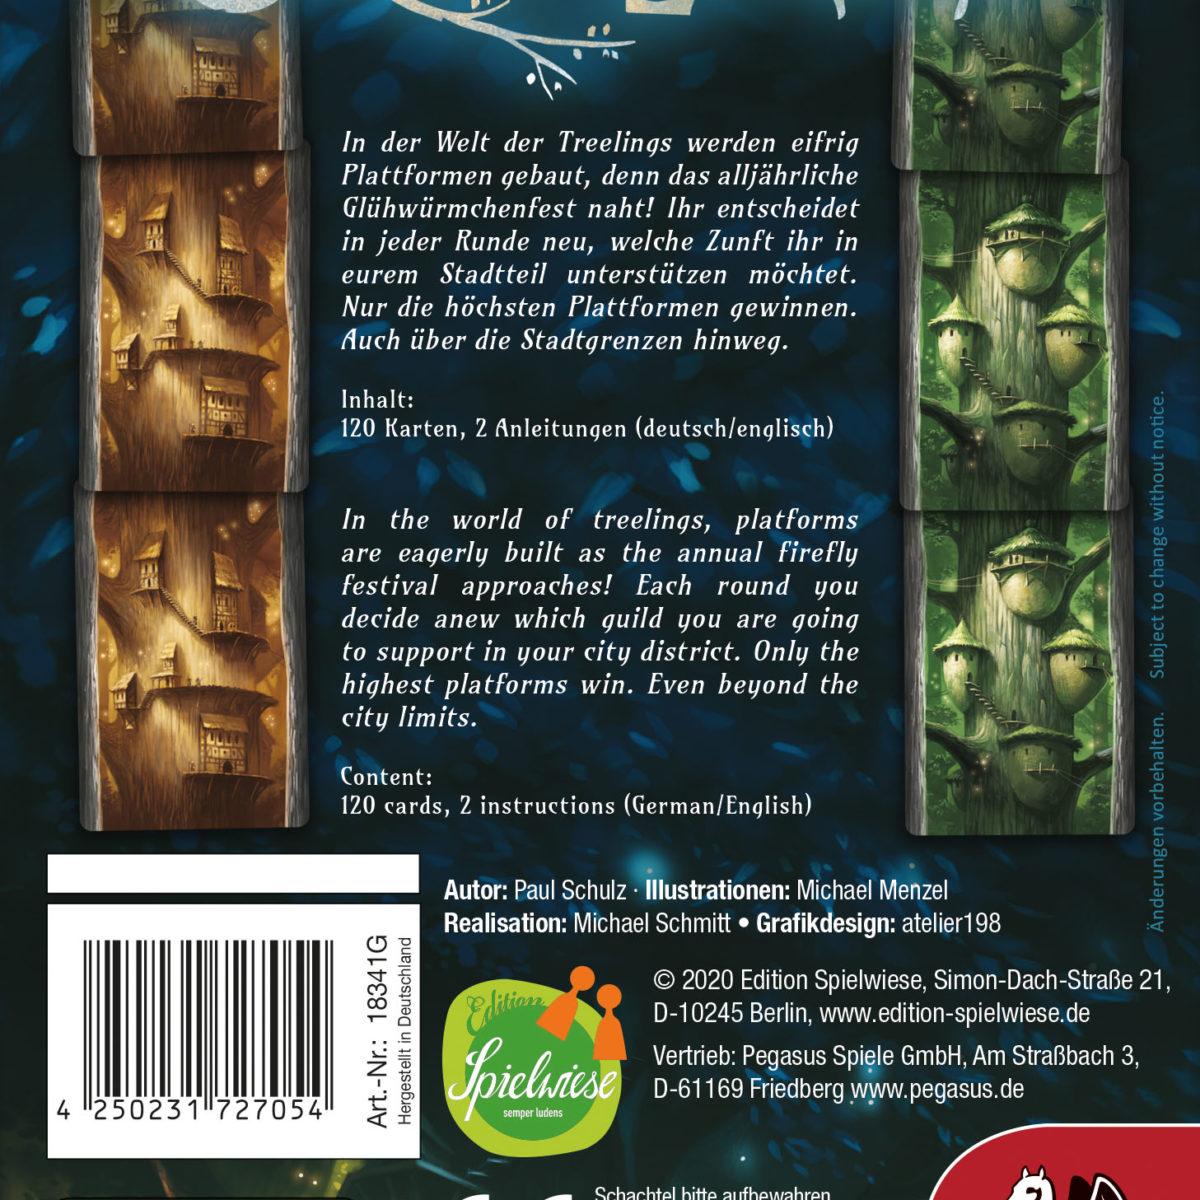 4250231727054_Treelings_Backcover_RGB